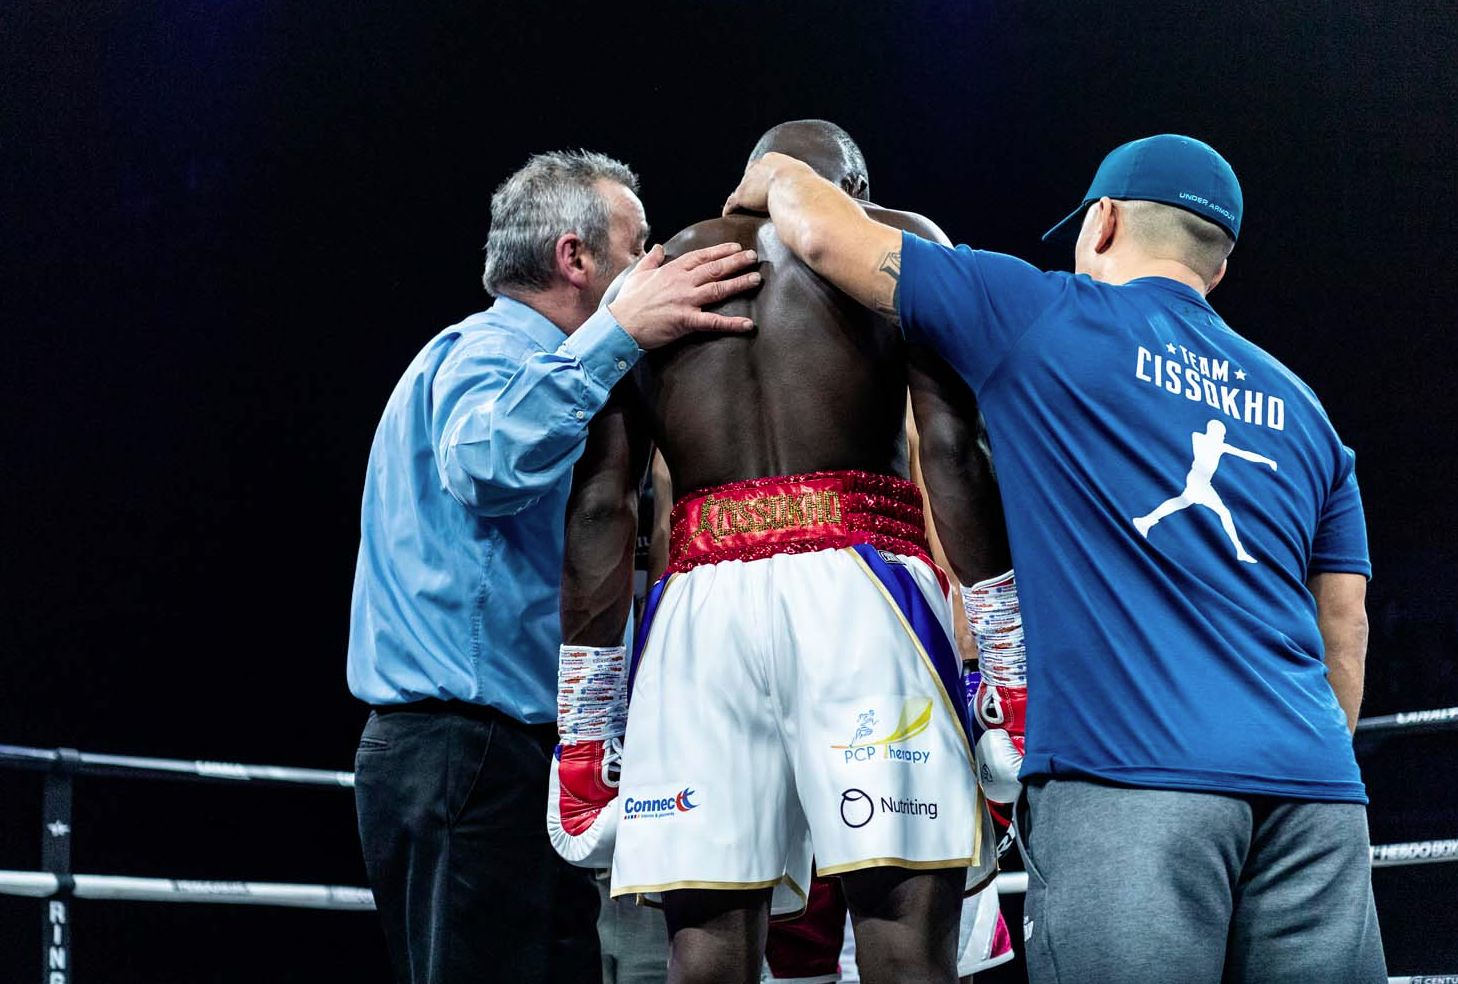 Souleymane Cissokho_Short Nutriting